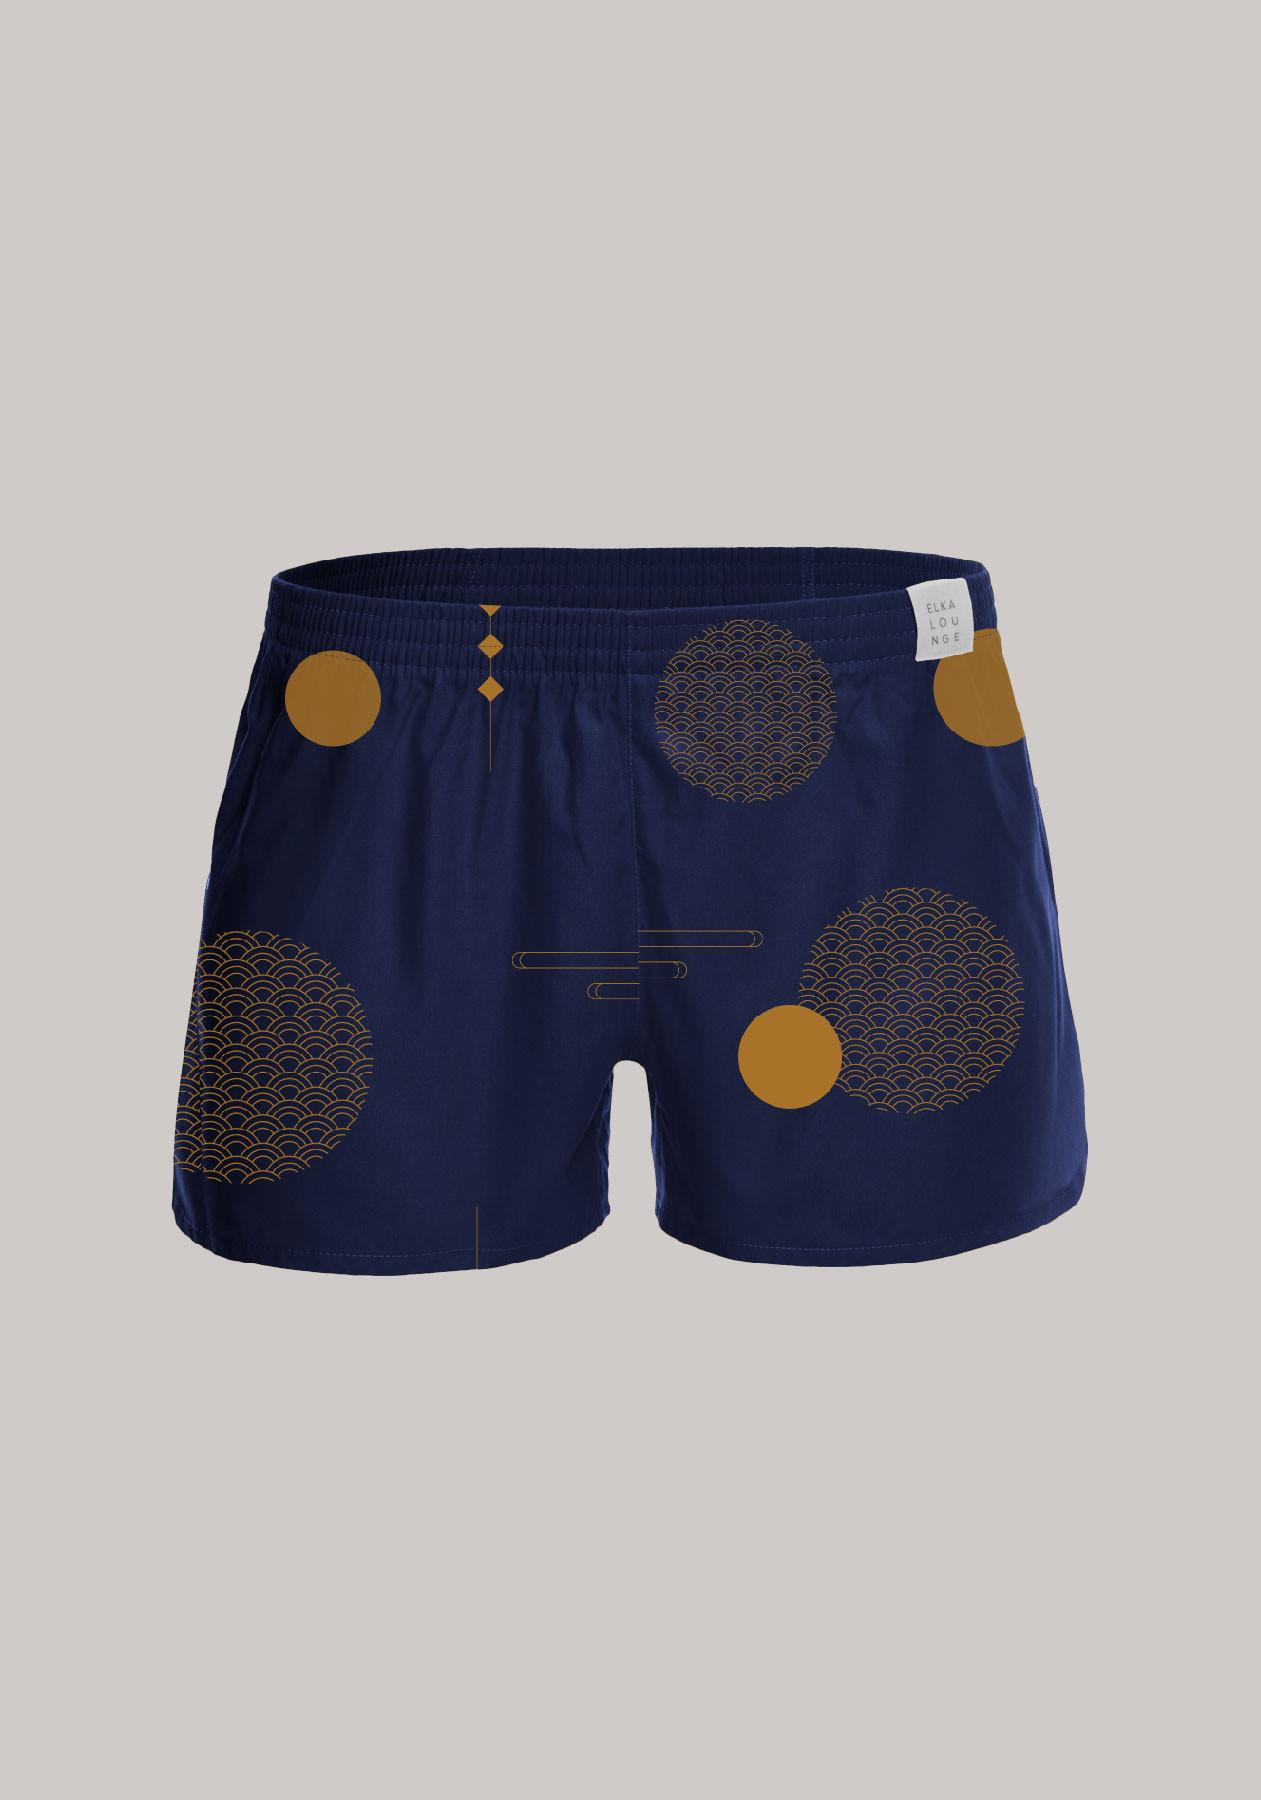 Women-Boxershorts-ELKA-Lounge-W00655-01